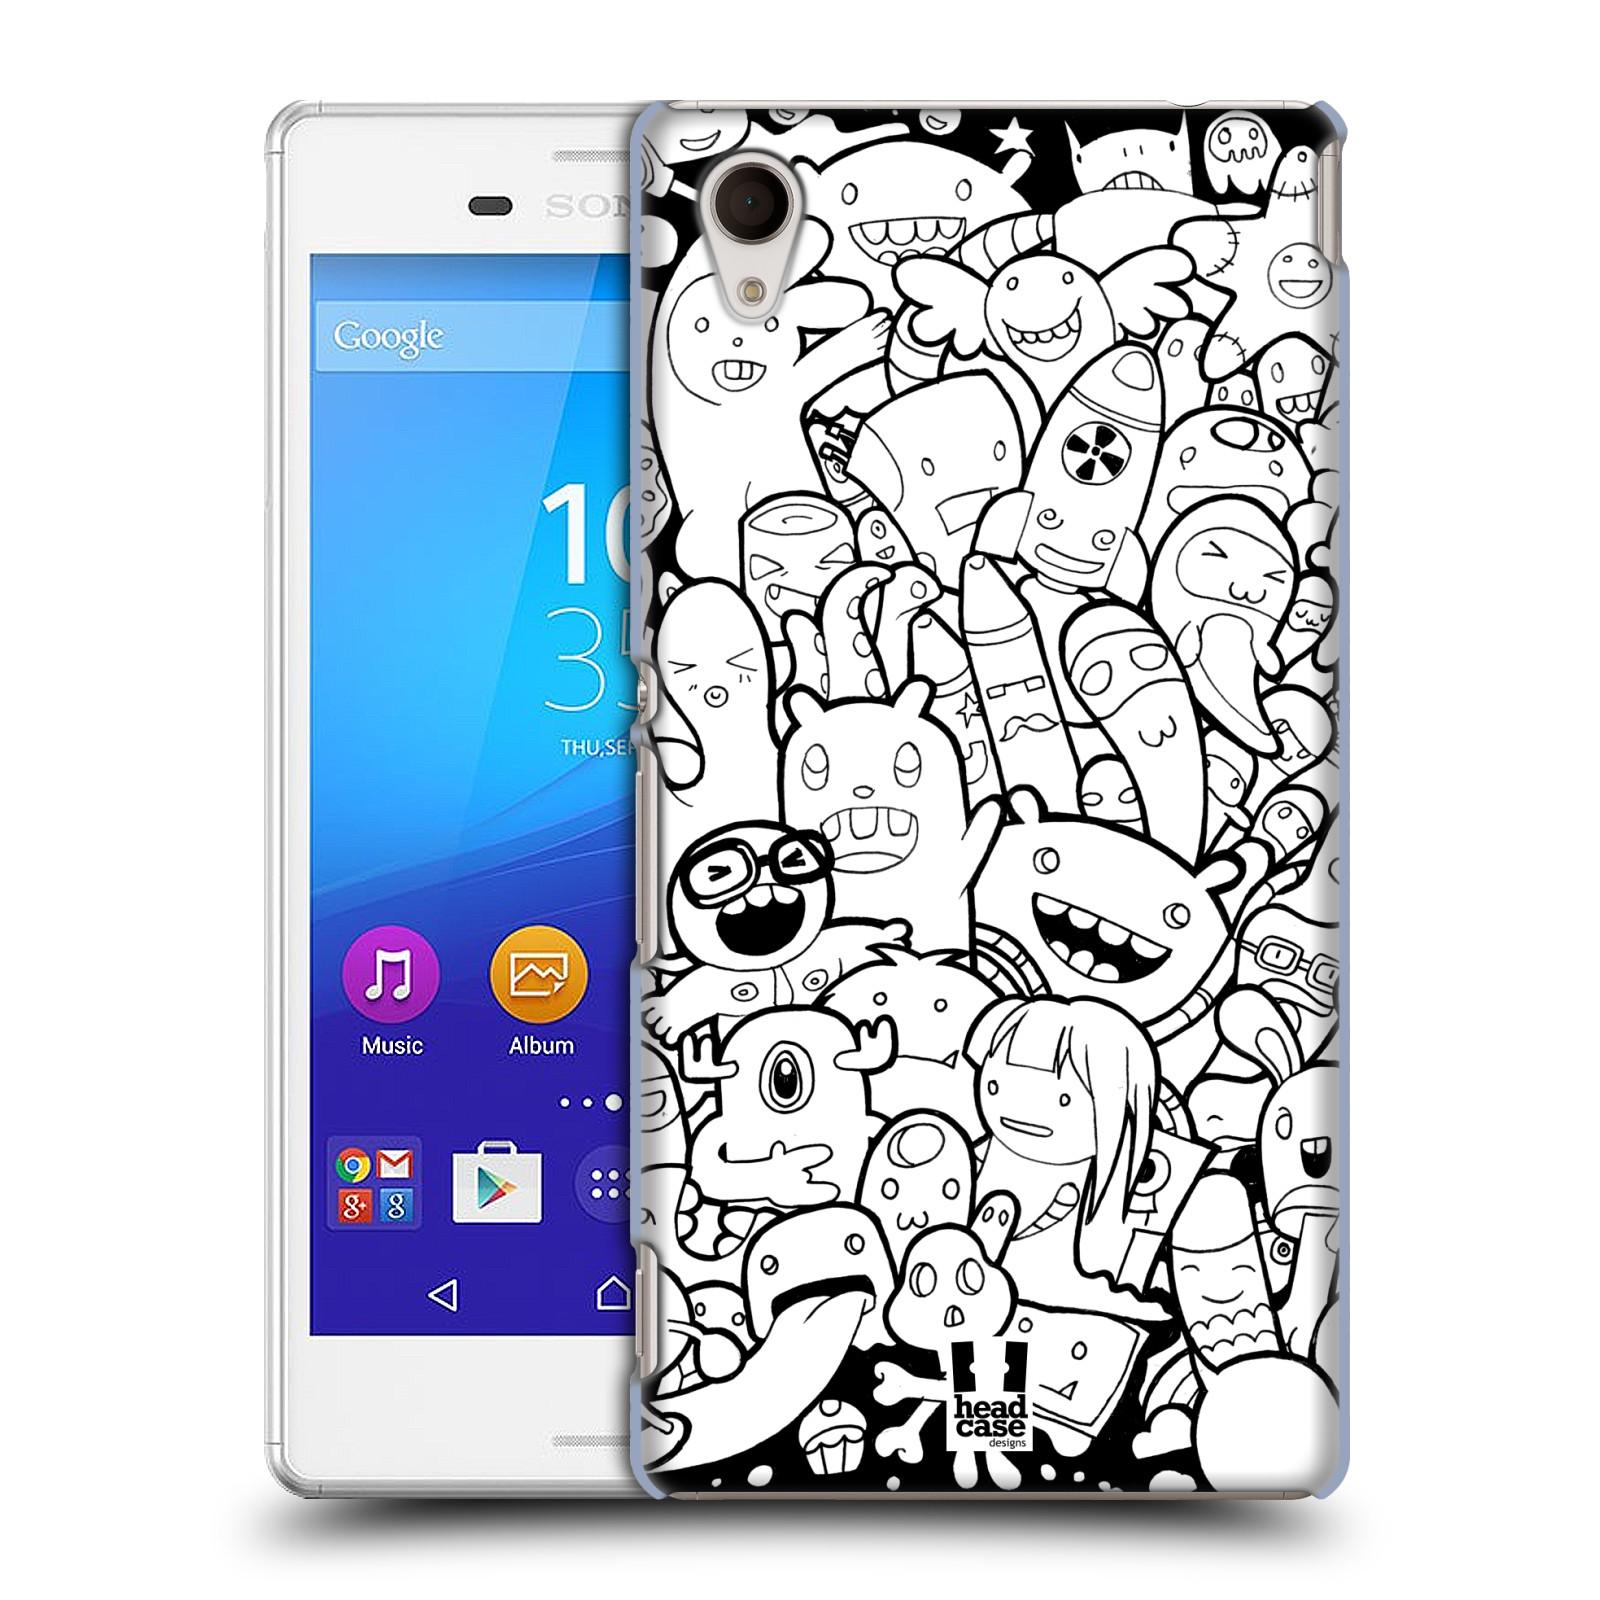 Plastové pouzdro na mobil Sony Xperia M4 Aqua E2303 HEAD CASE DOODLE PŘÍŠERKY A MIMÍCI (Kryt či obal na mobilní telefon Sony Xperia M4 Aqua a M4 Aqua Dual SIM)